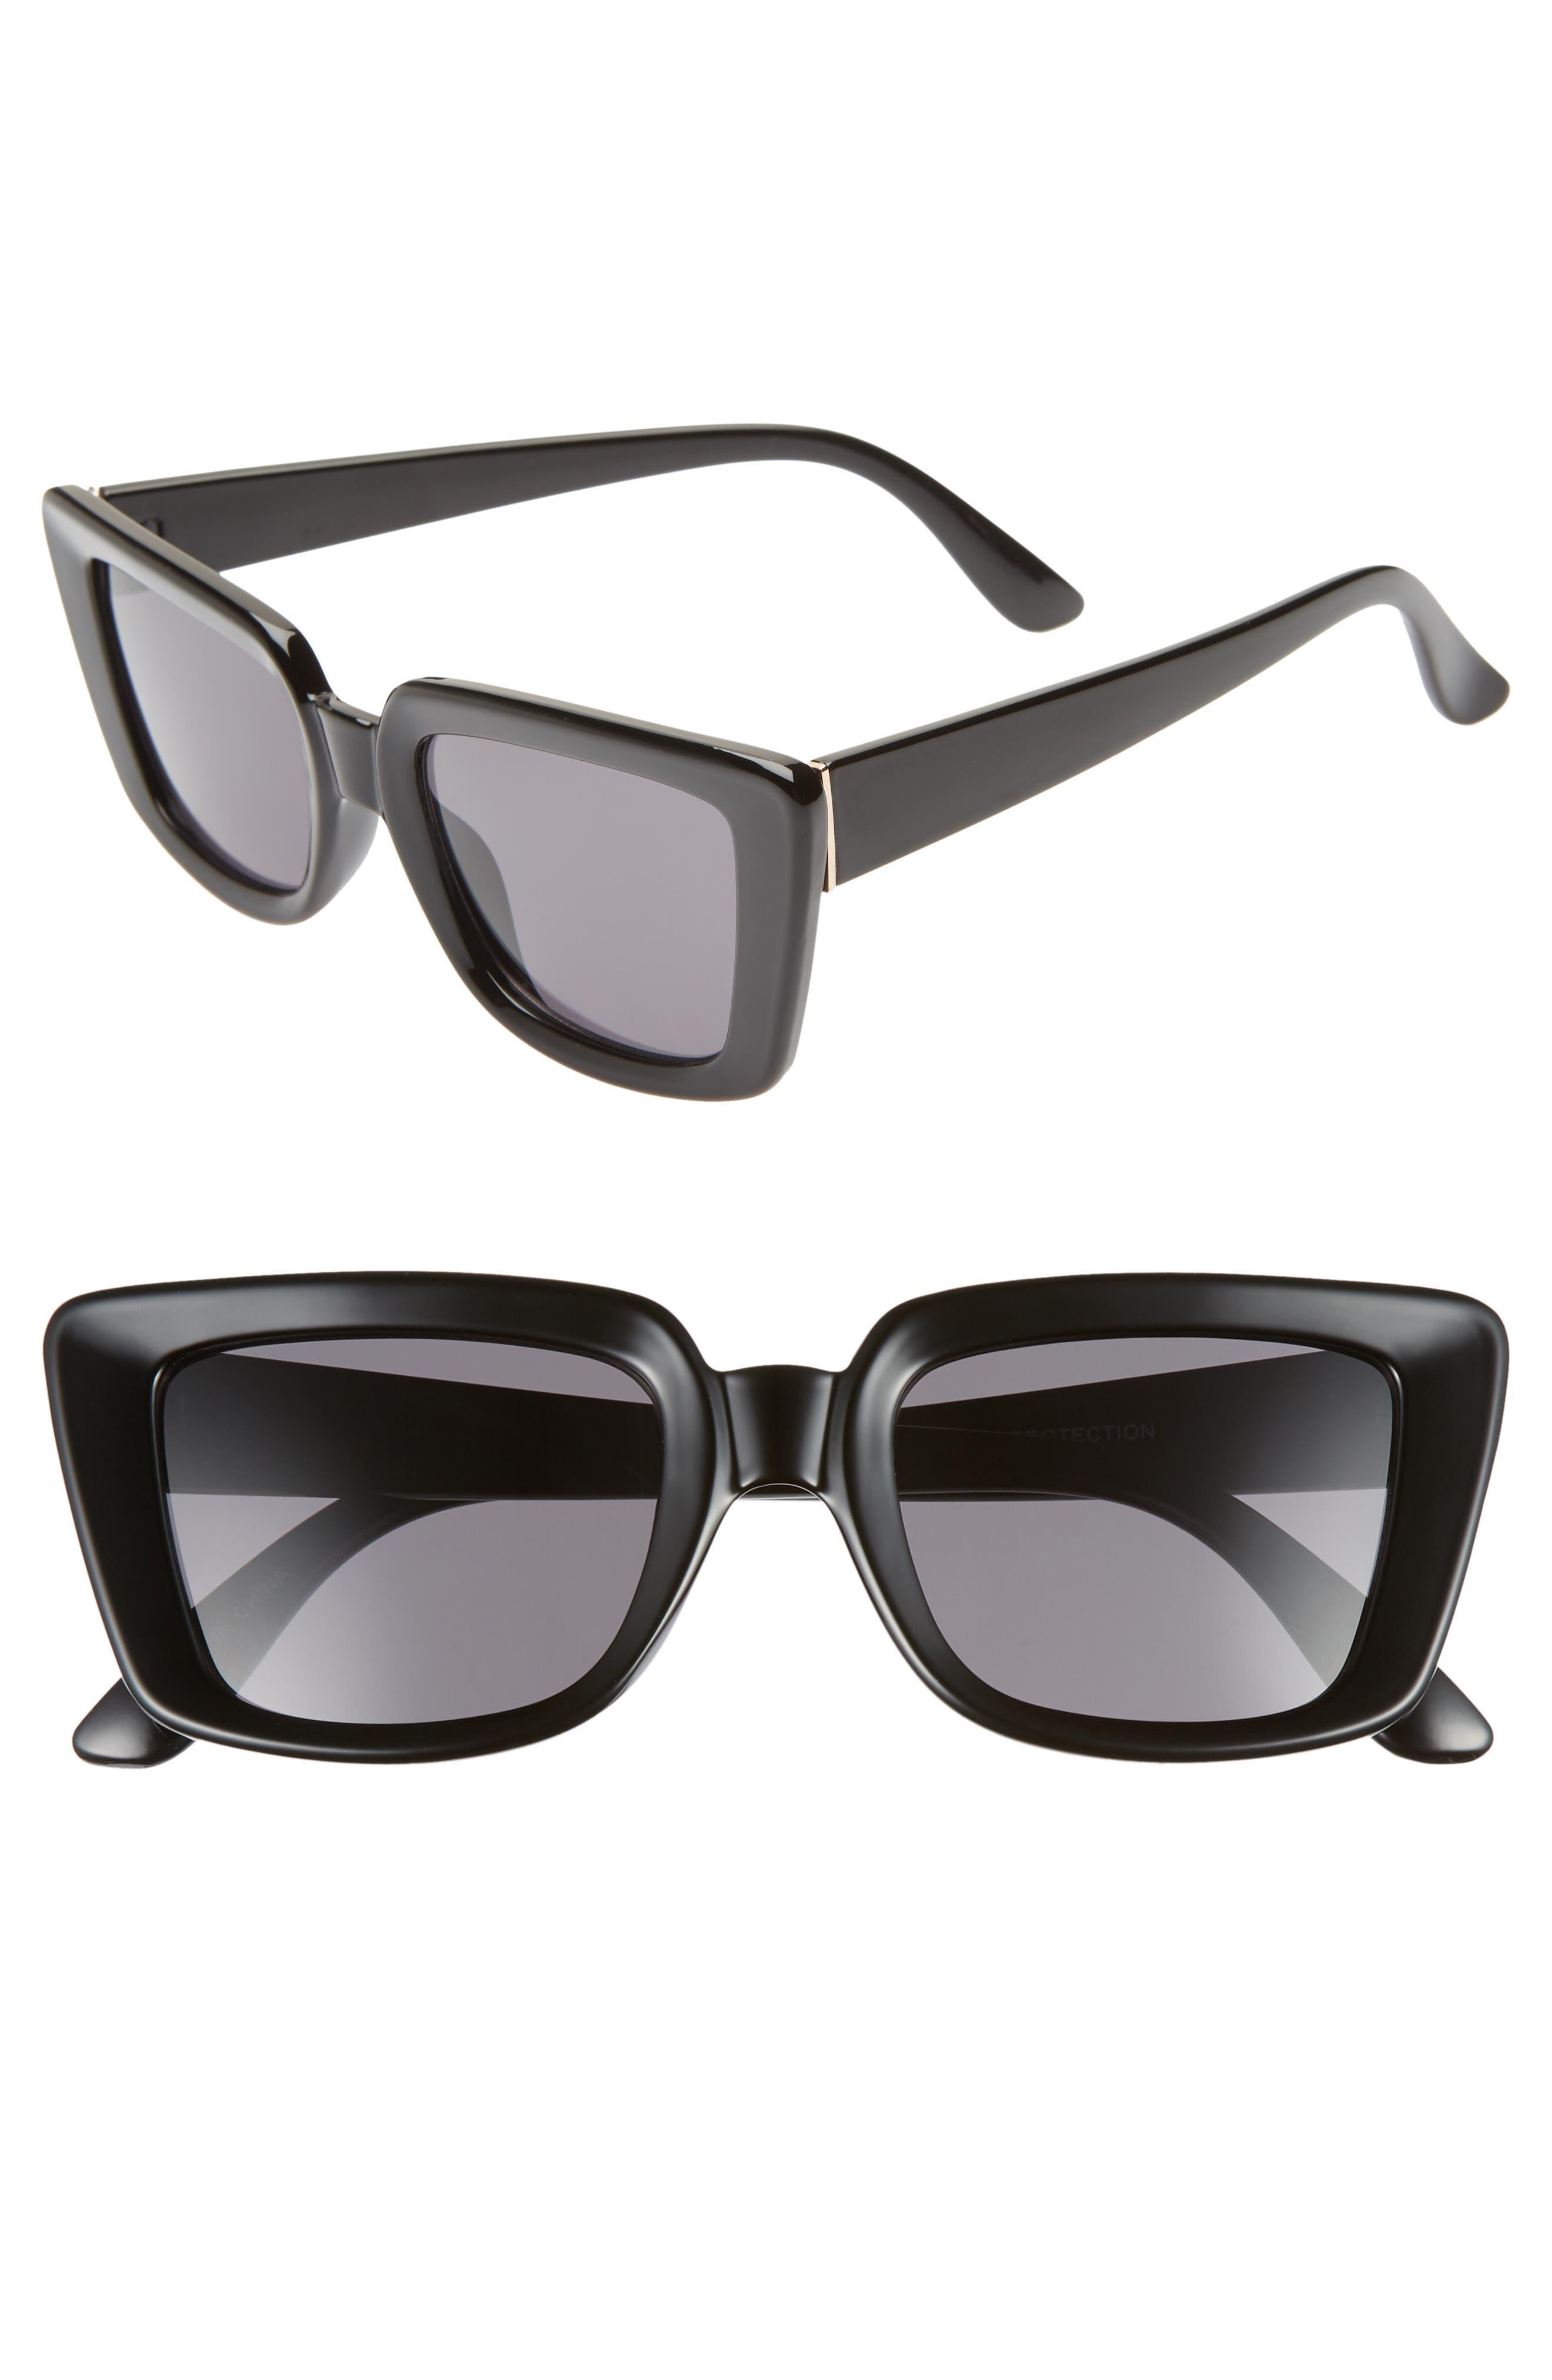 68mm Oversize Square Sunglasses,                         Main,                         color, BLACK/ GOLD